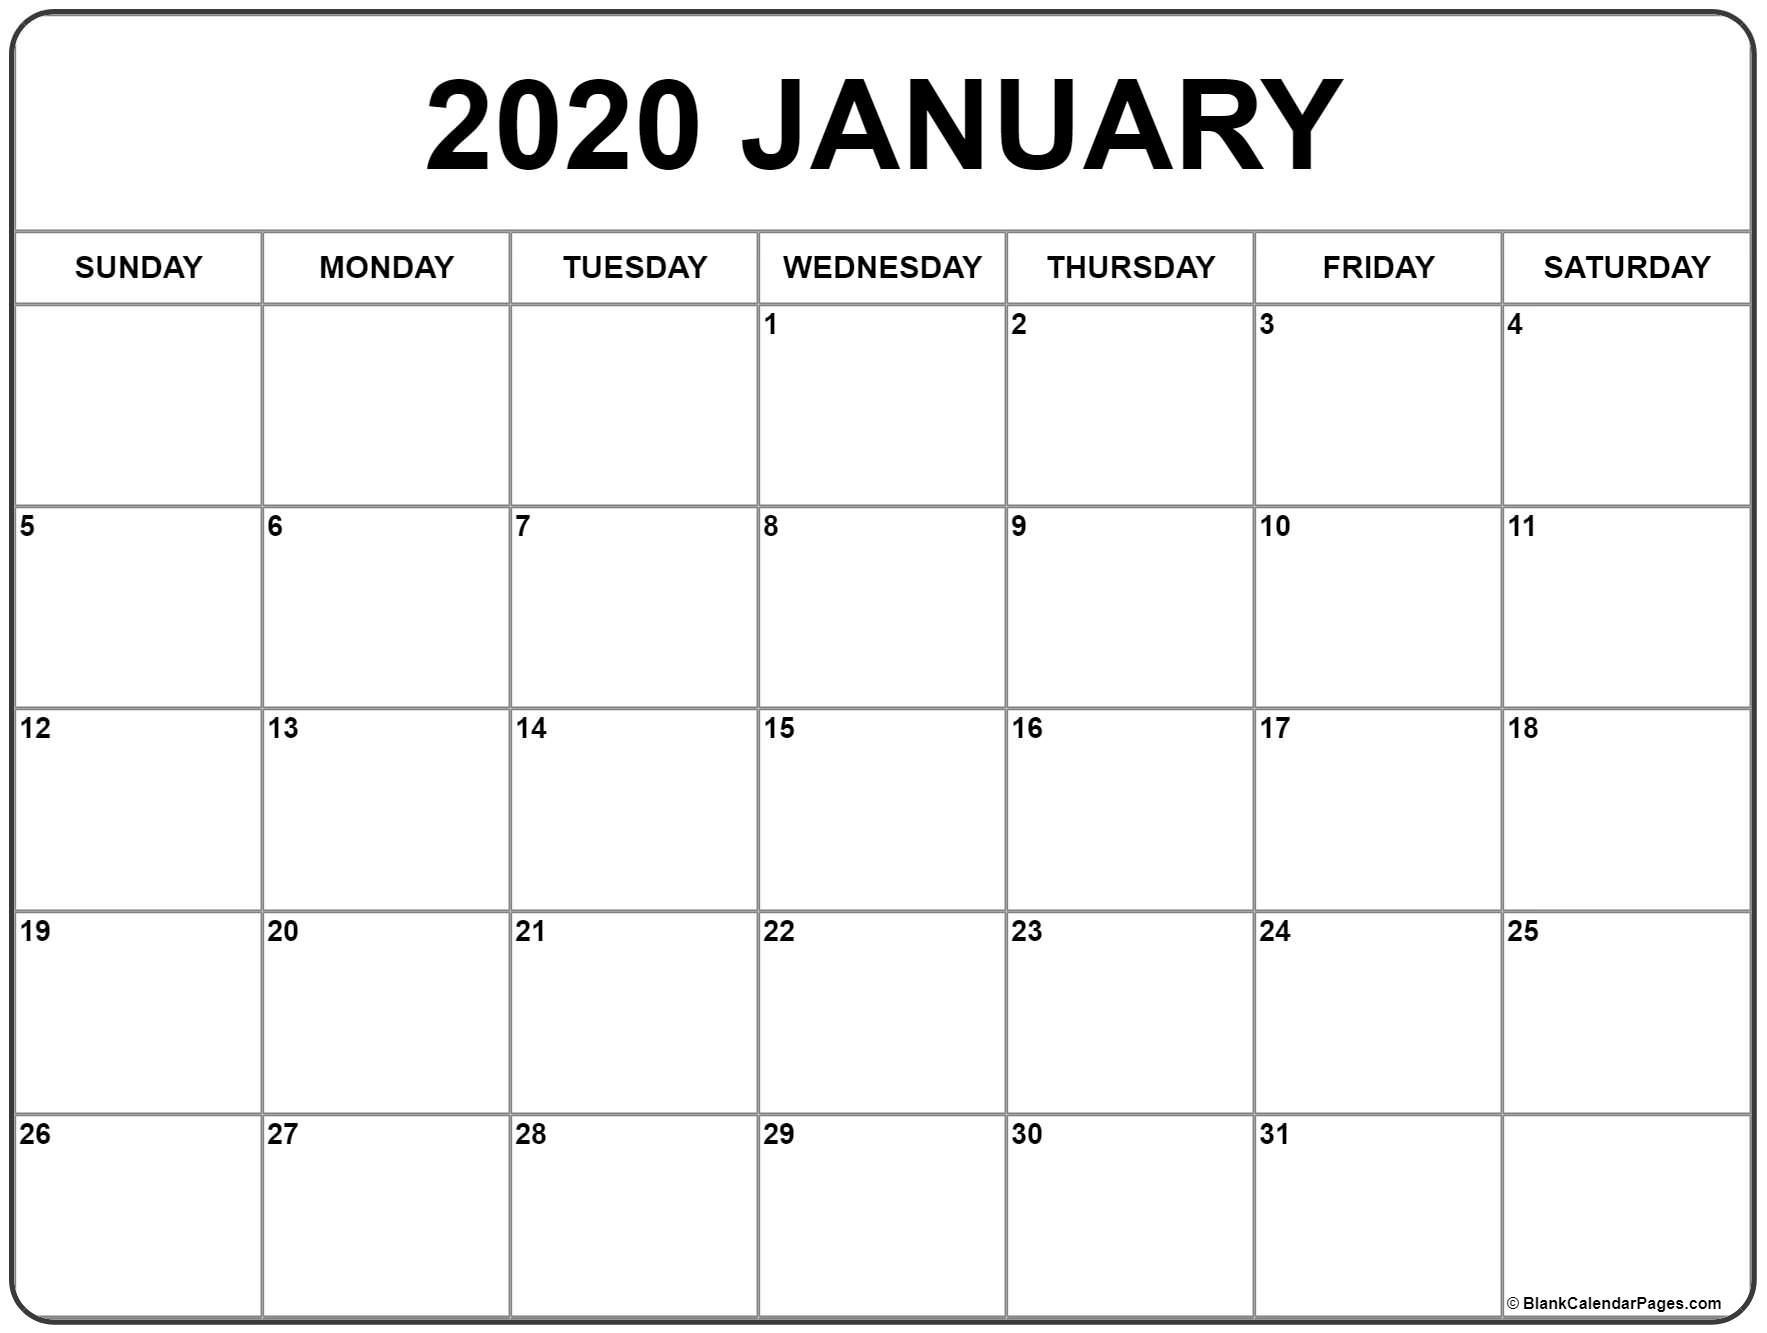 January 2020 Calendar | Free Printable Monthly Calendars-January 2020 Calendar Cute